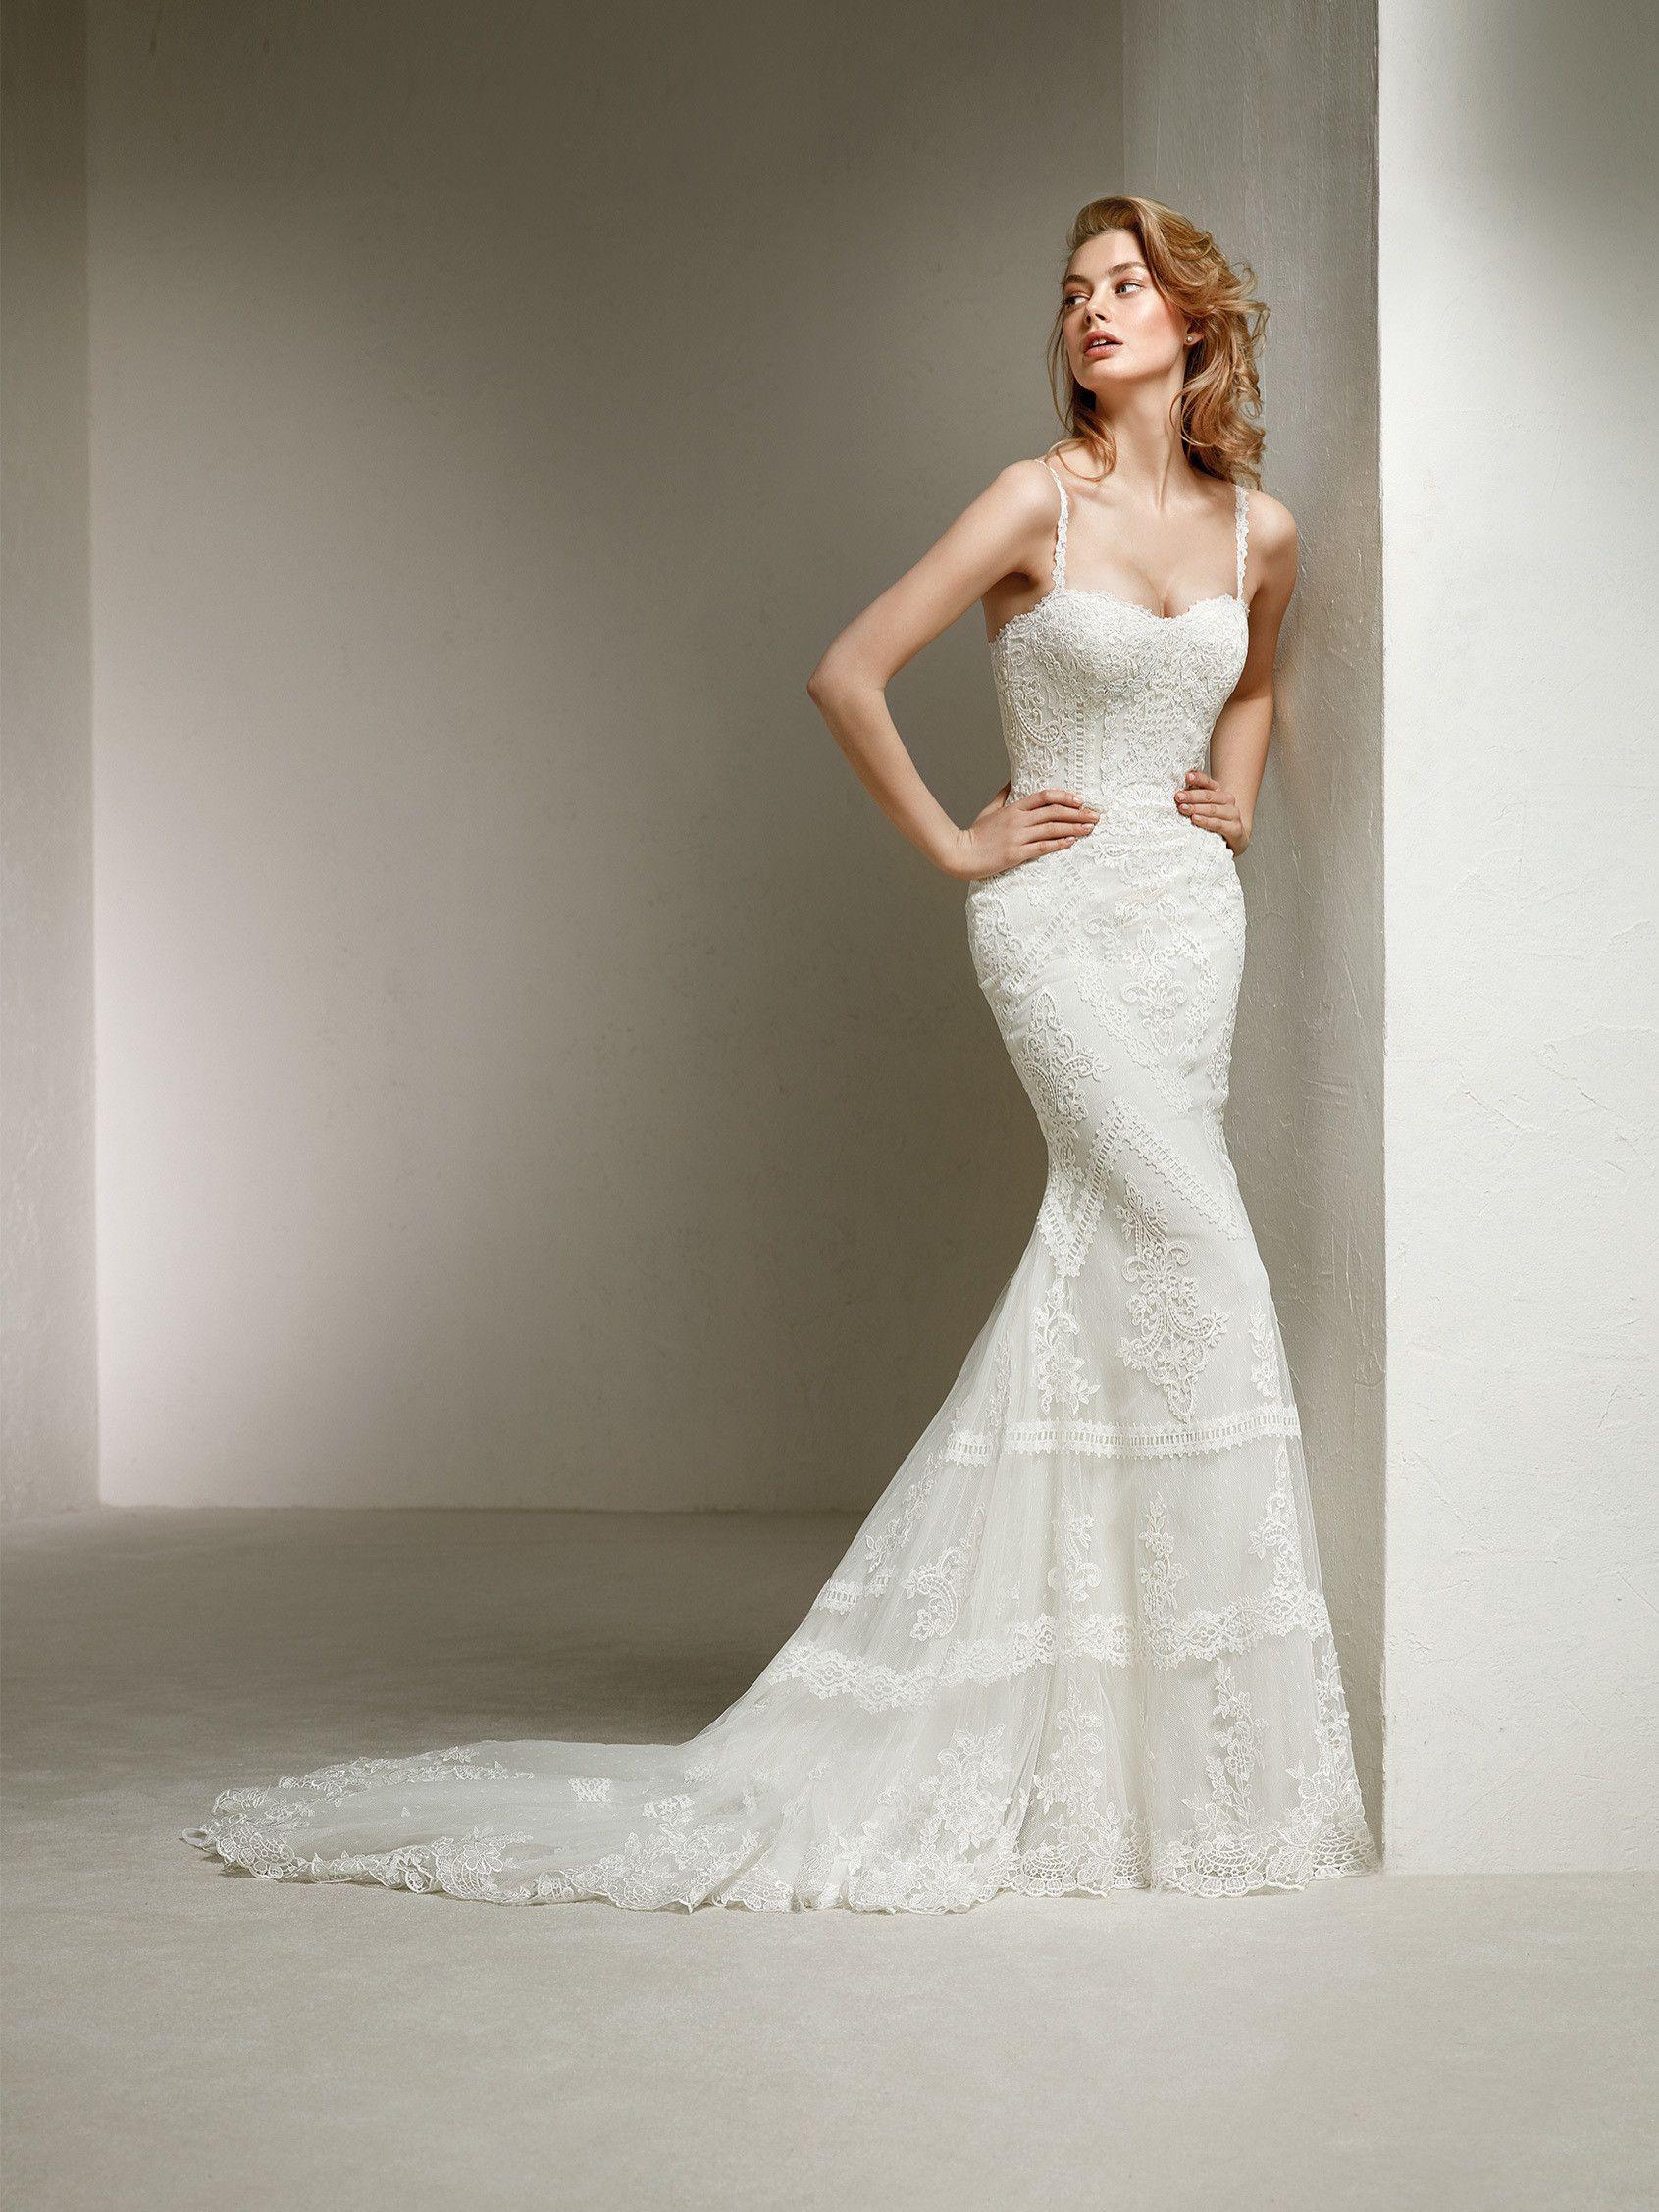 Mermaid dress wedding  bohemian mermaid wedding dress  vestidos boda  Pinterest  Mermaid